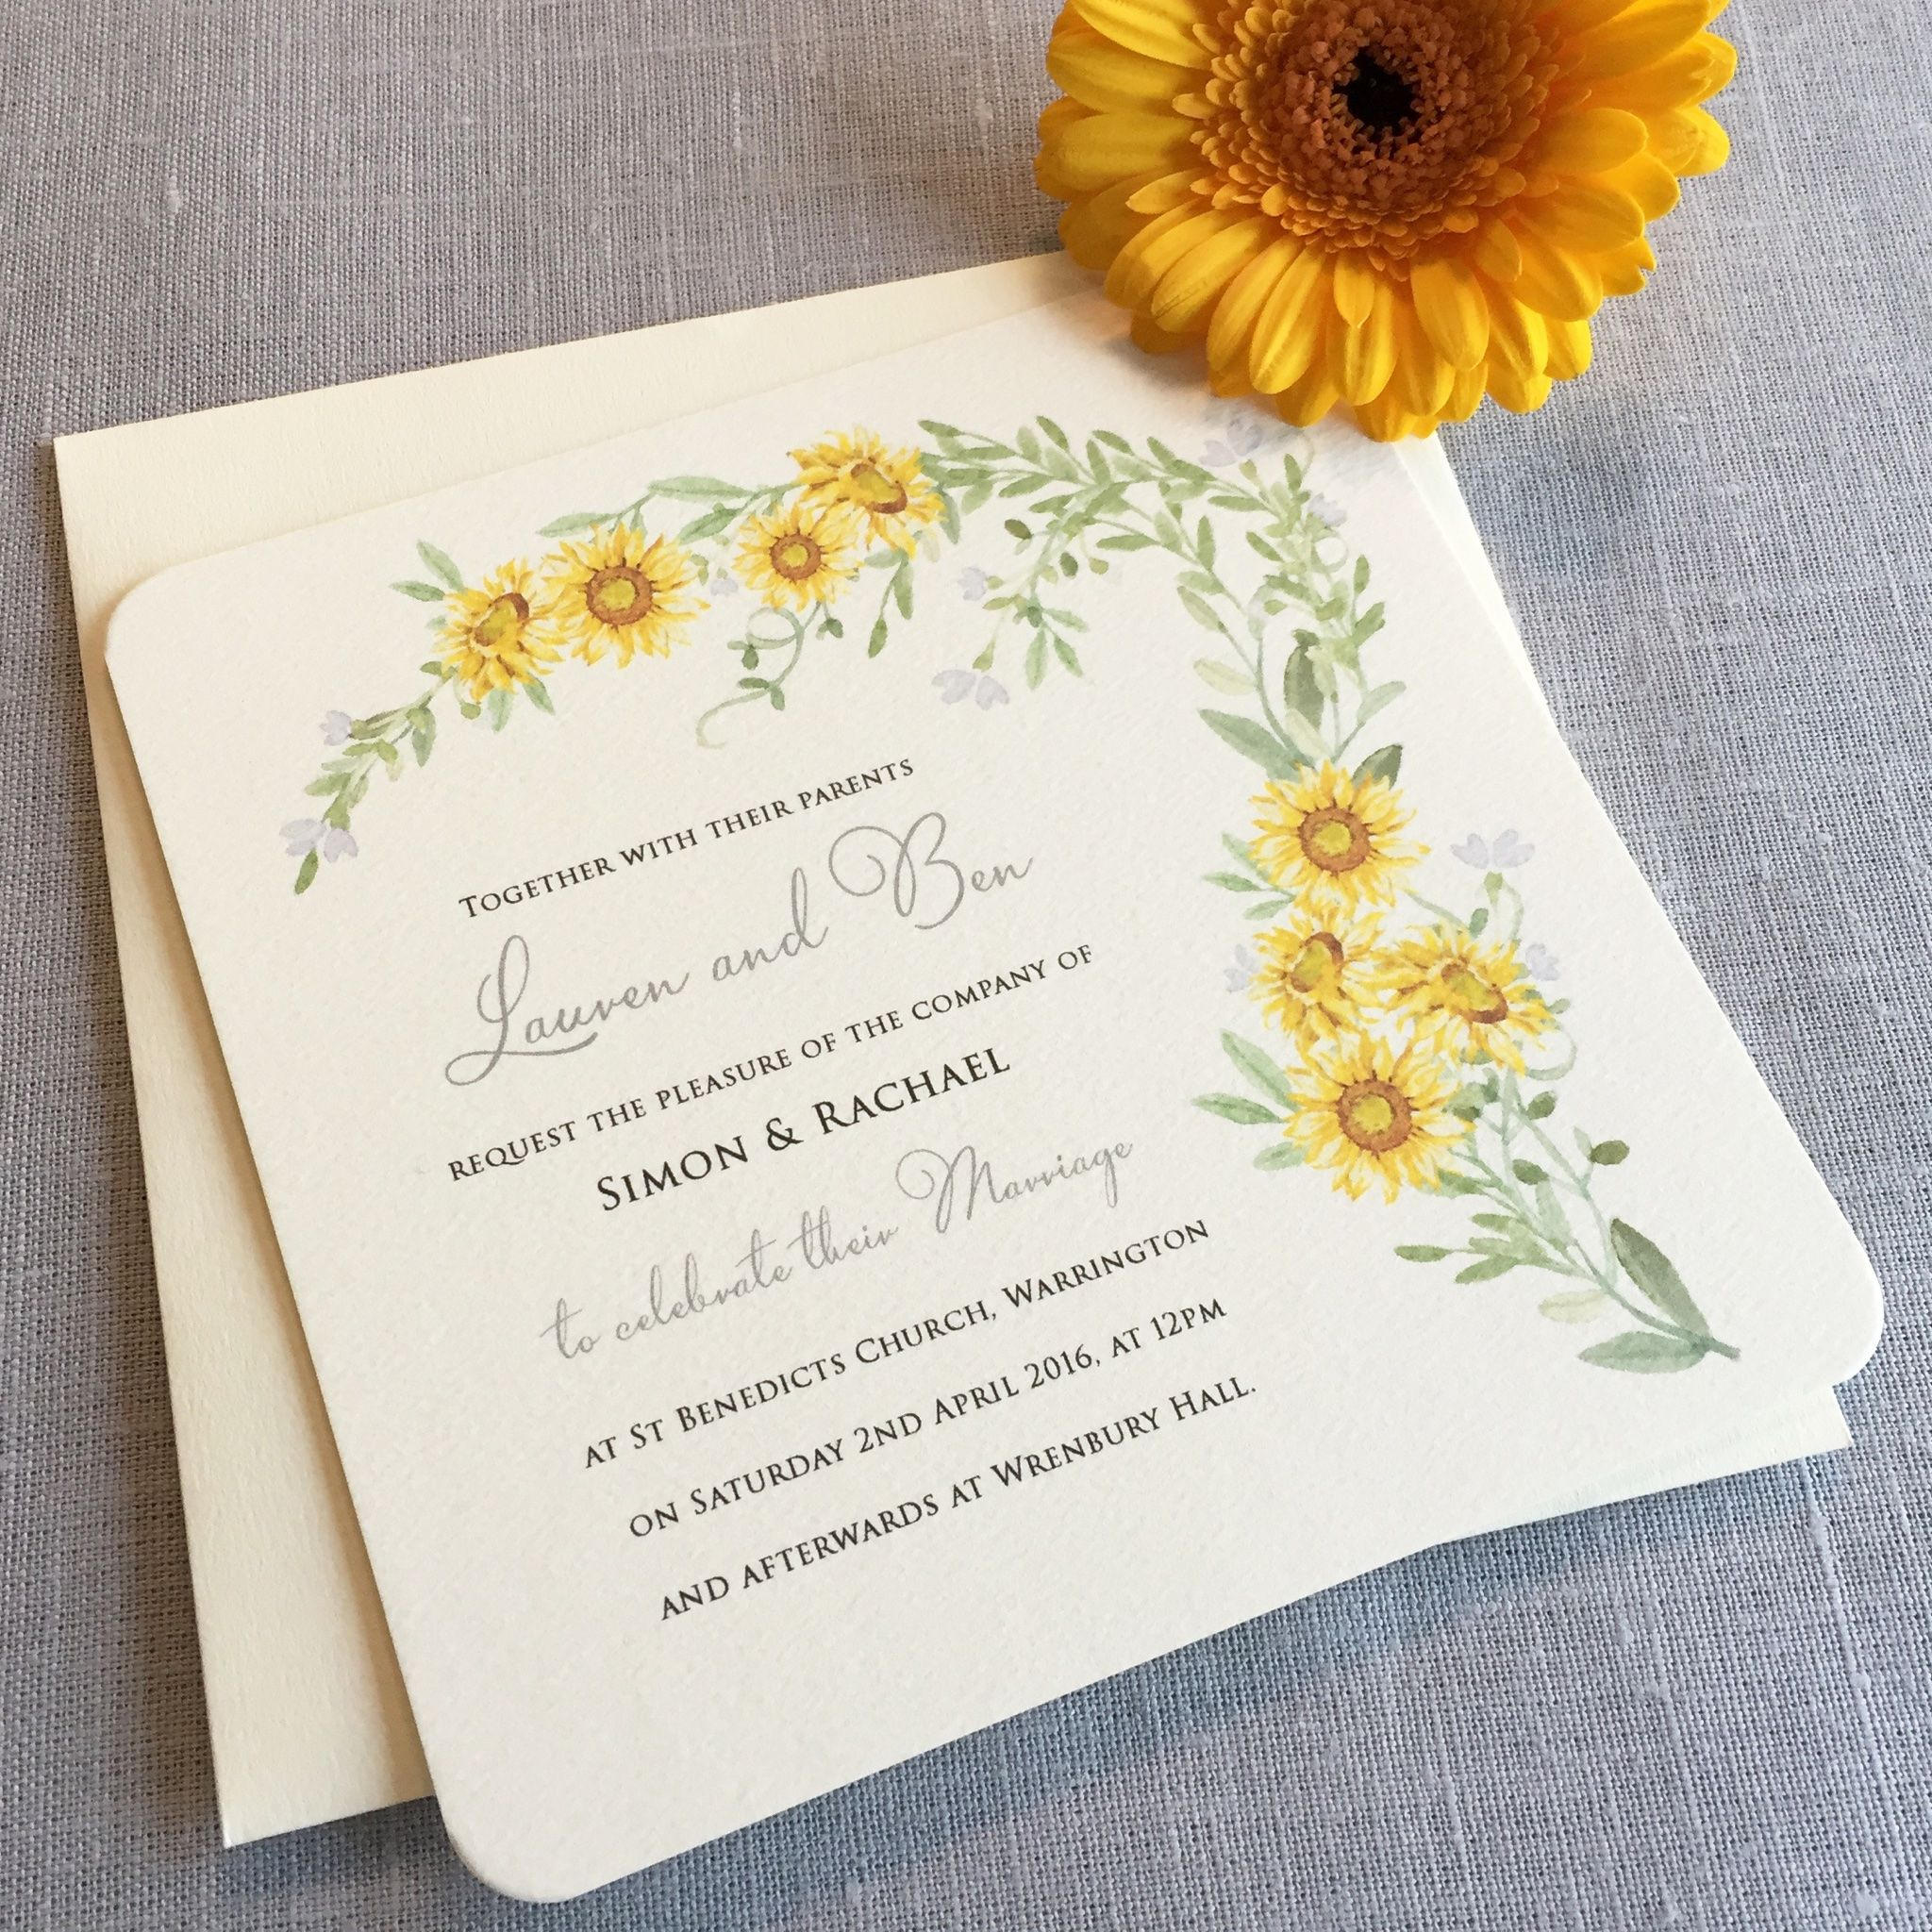 Sunflower wedding invite | wedding invitation | Pinterest | Floral ...